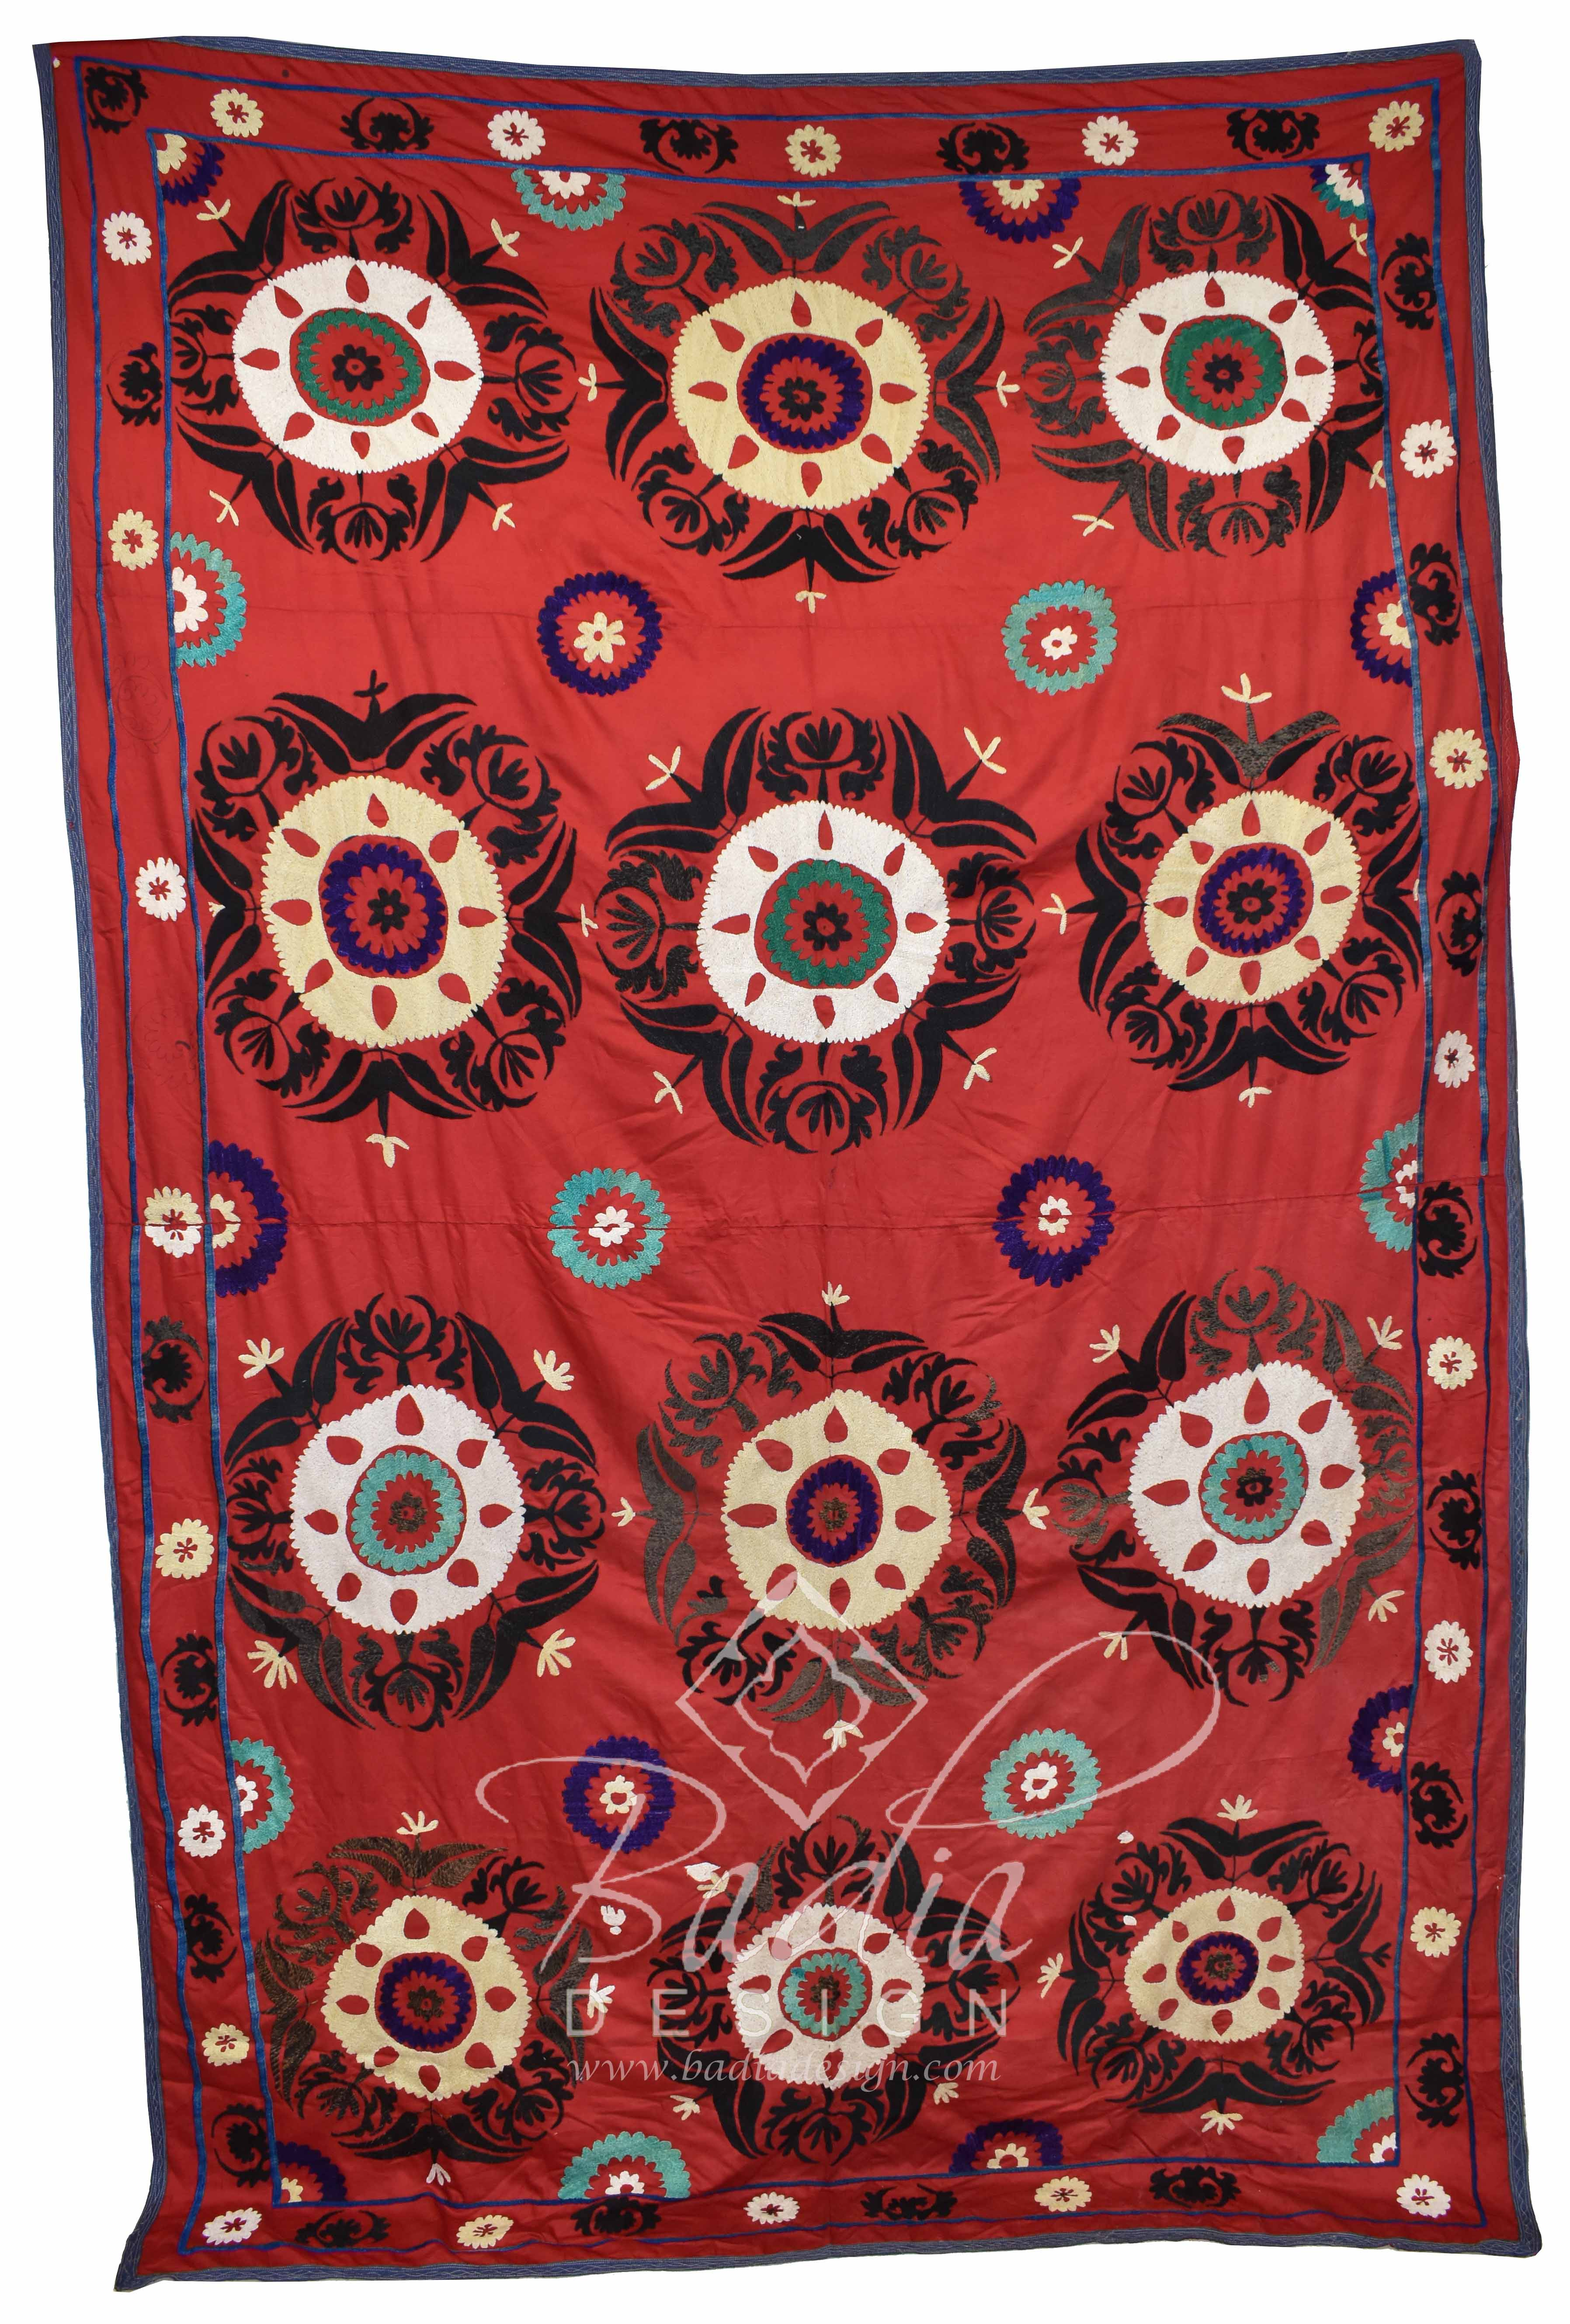 tribal-textile-suzani-quilt-suzqlt013.jpg